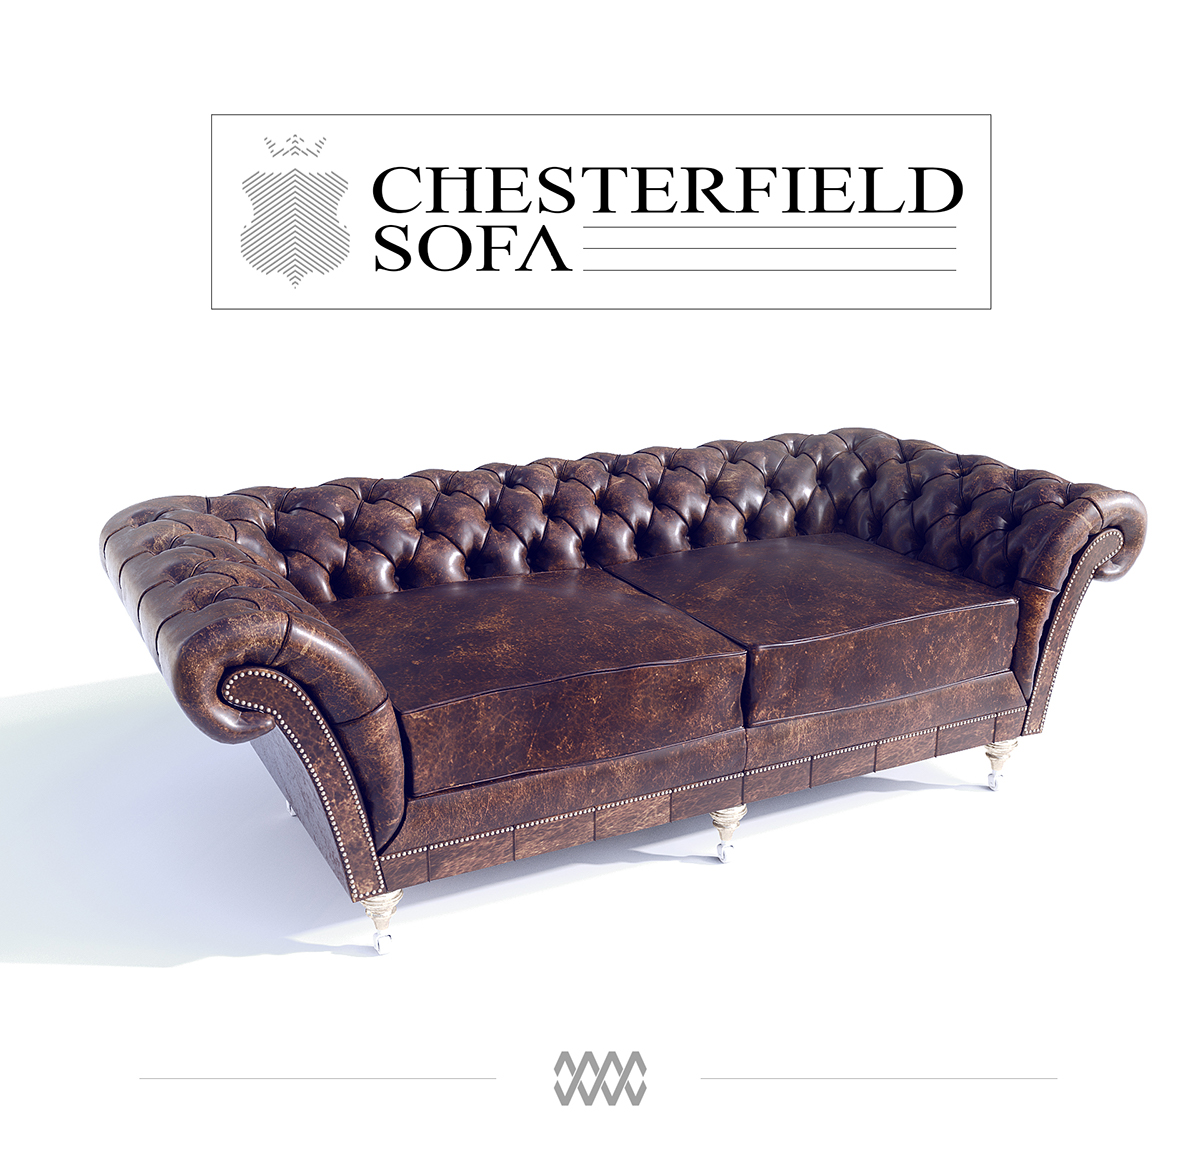 chesterfield sofa free 3D model on Behance